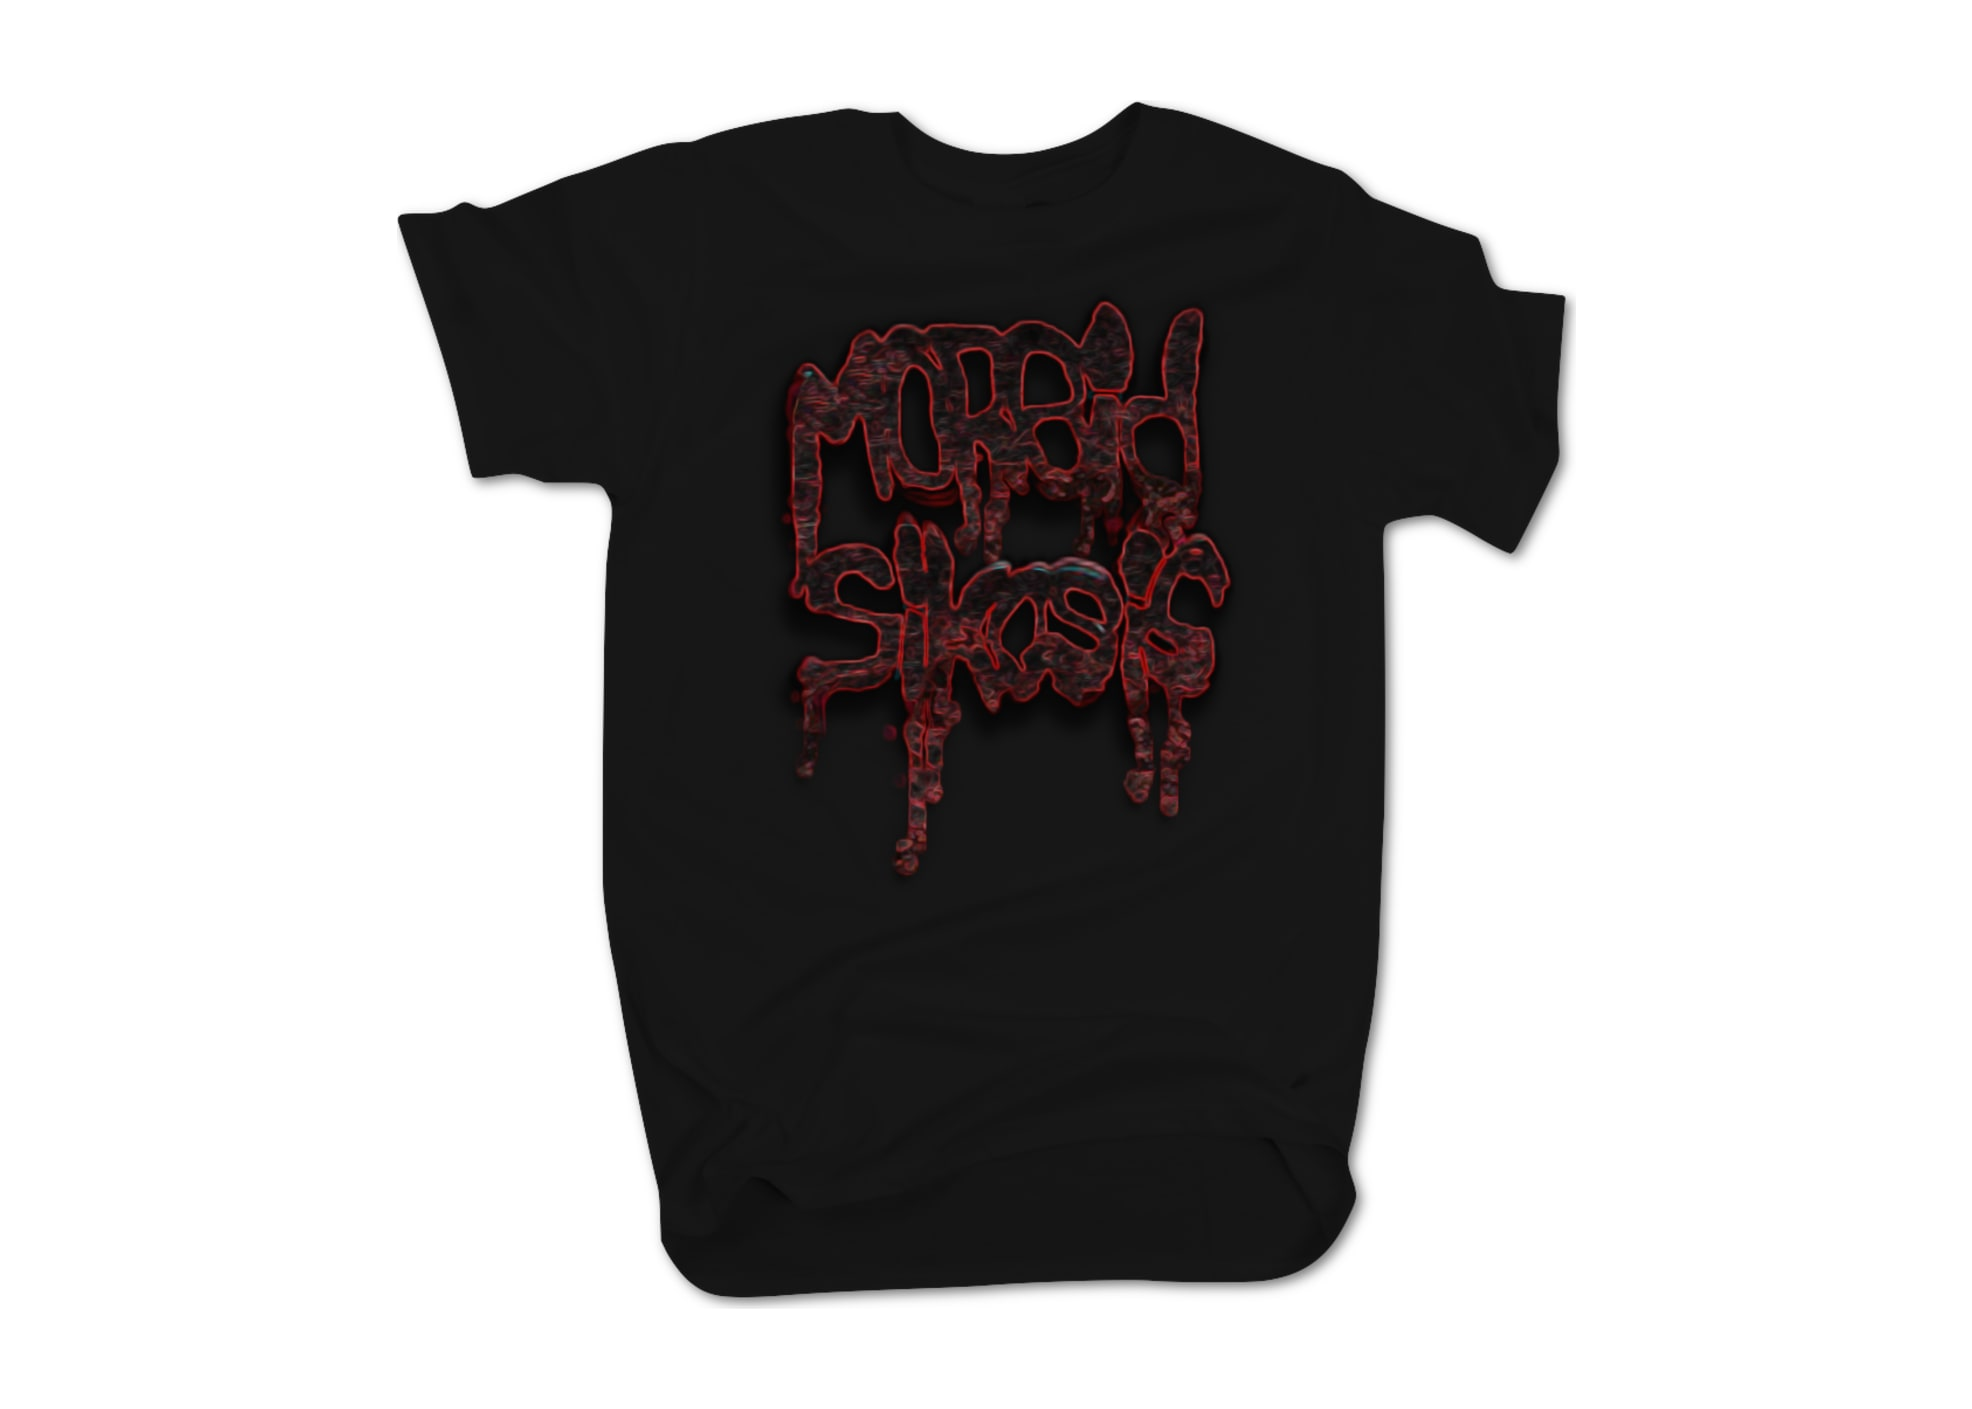 Morbid sikosis morbid bloody  black  1595804178